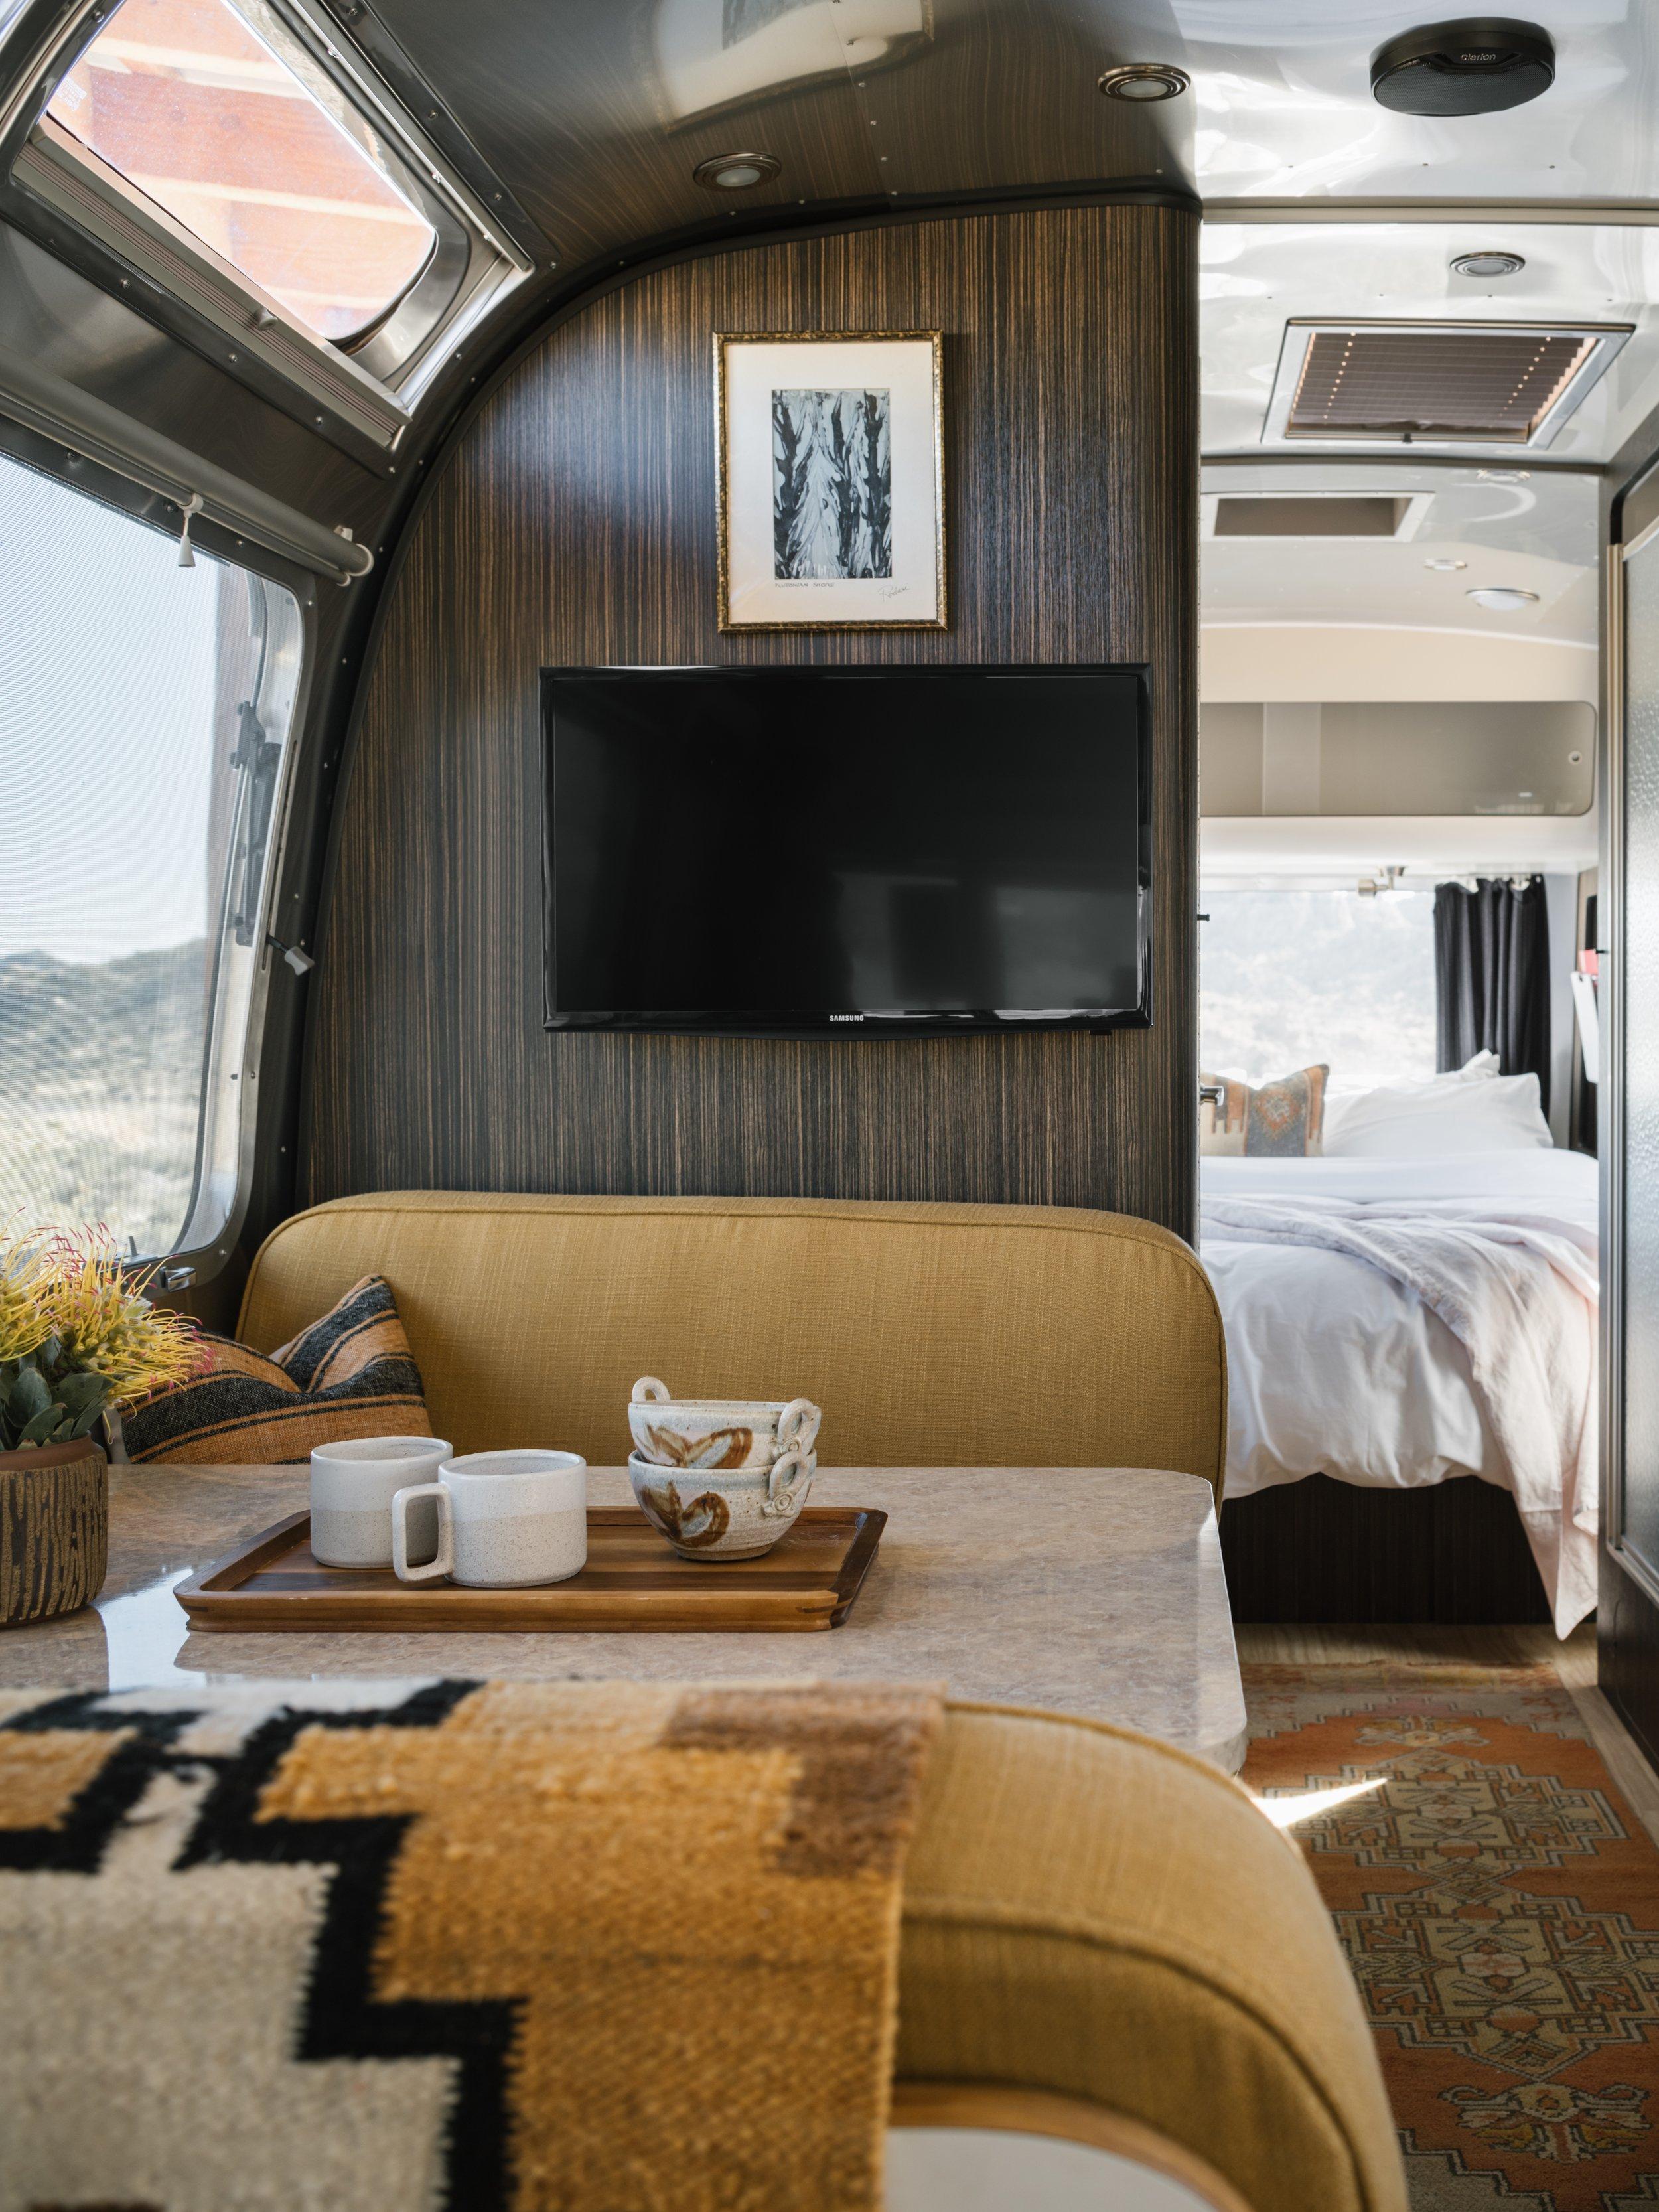 Airstream Interior 1.jpeg